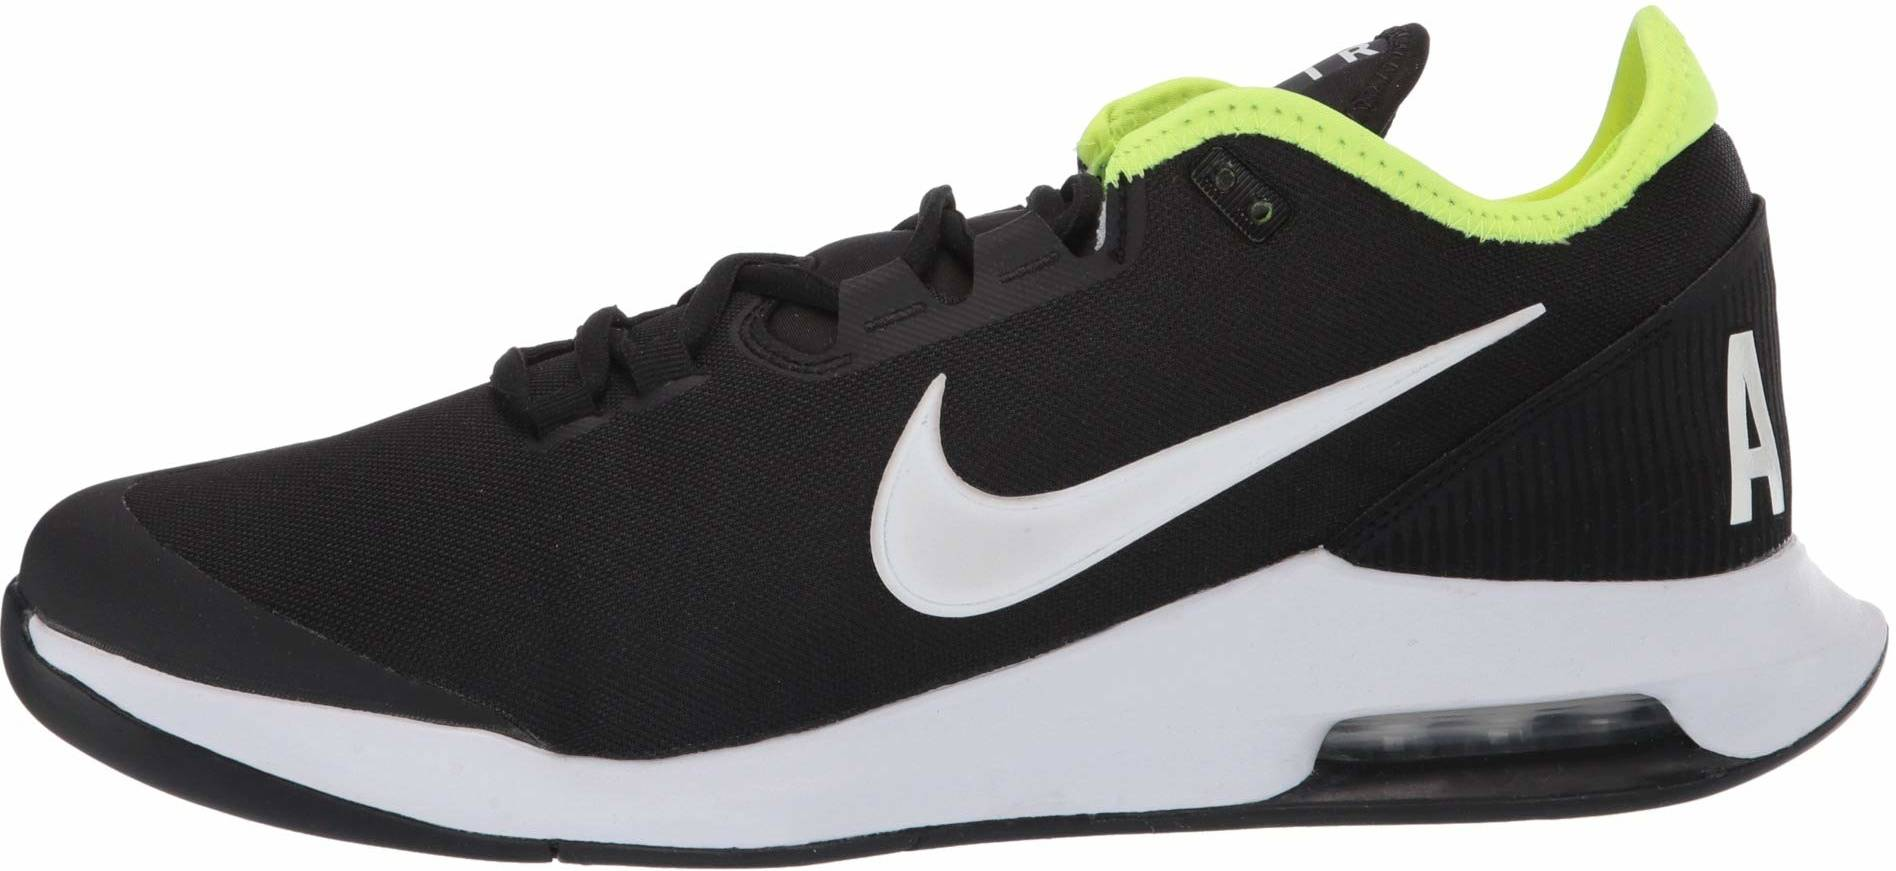 NikeCourt Air Max Wildcard - Deals (£80), Facts, Reviews (2021 ...